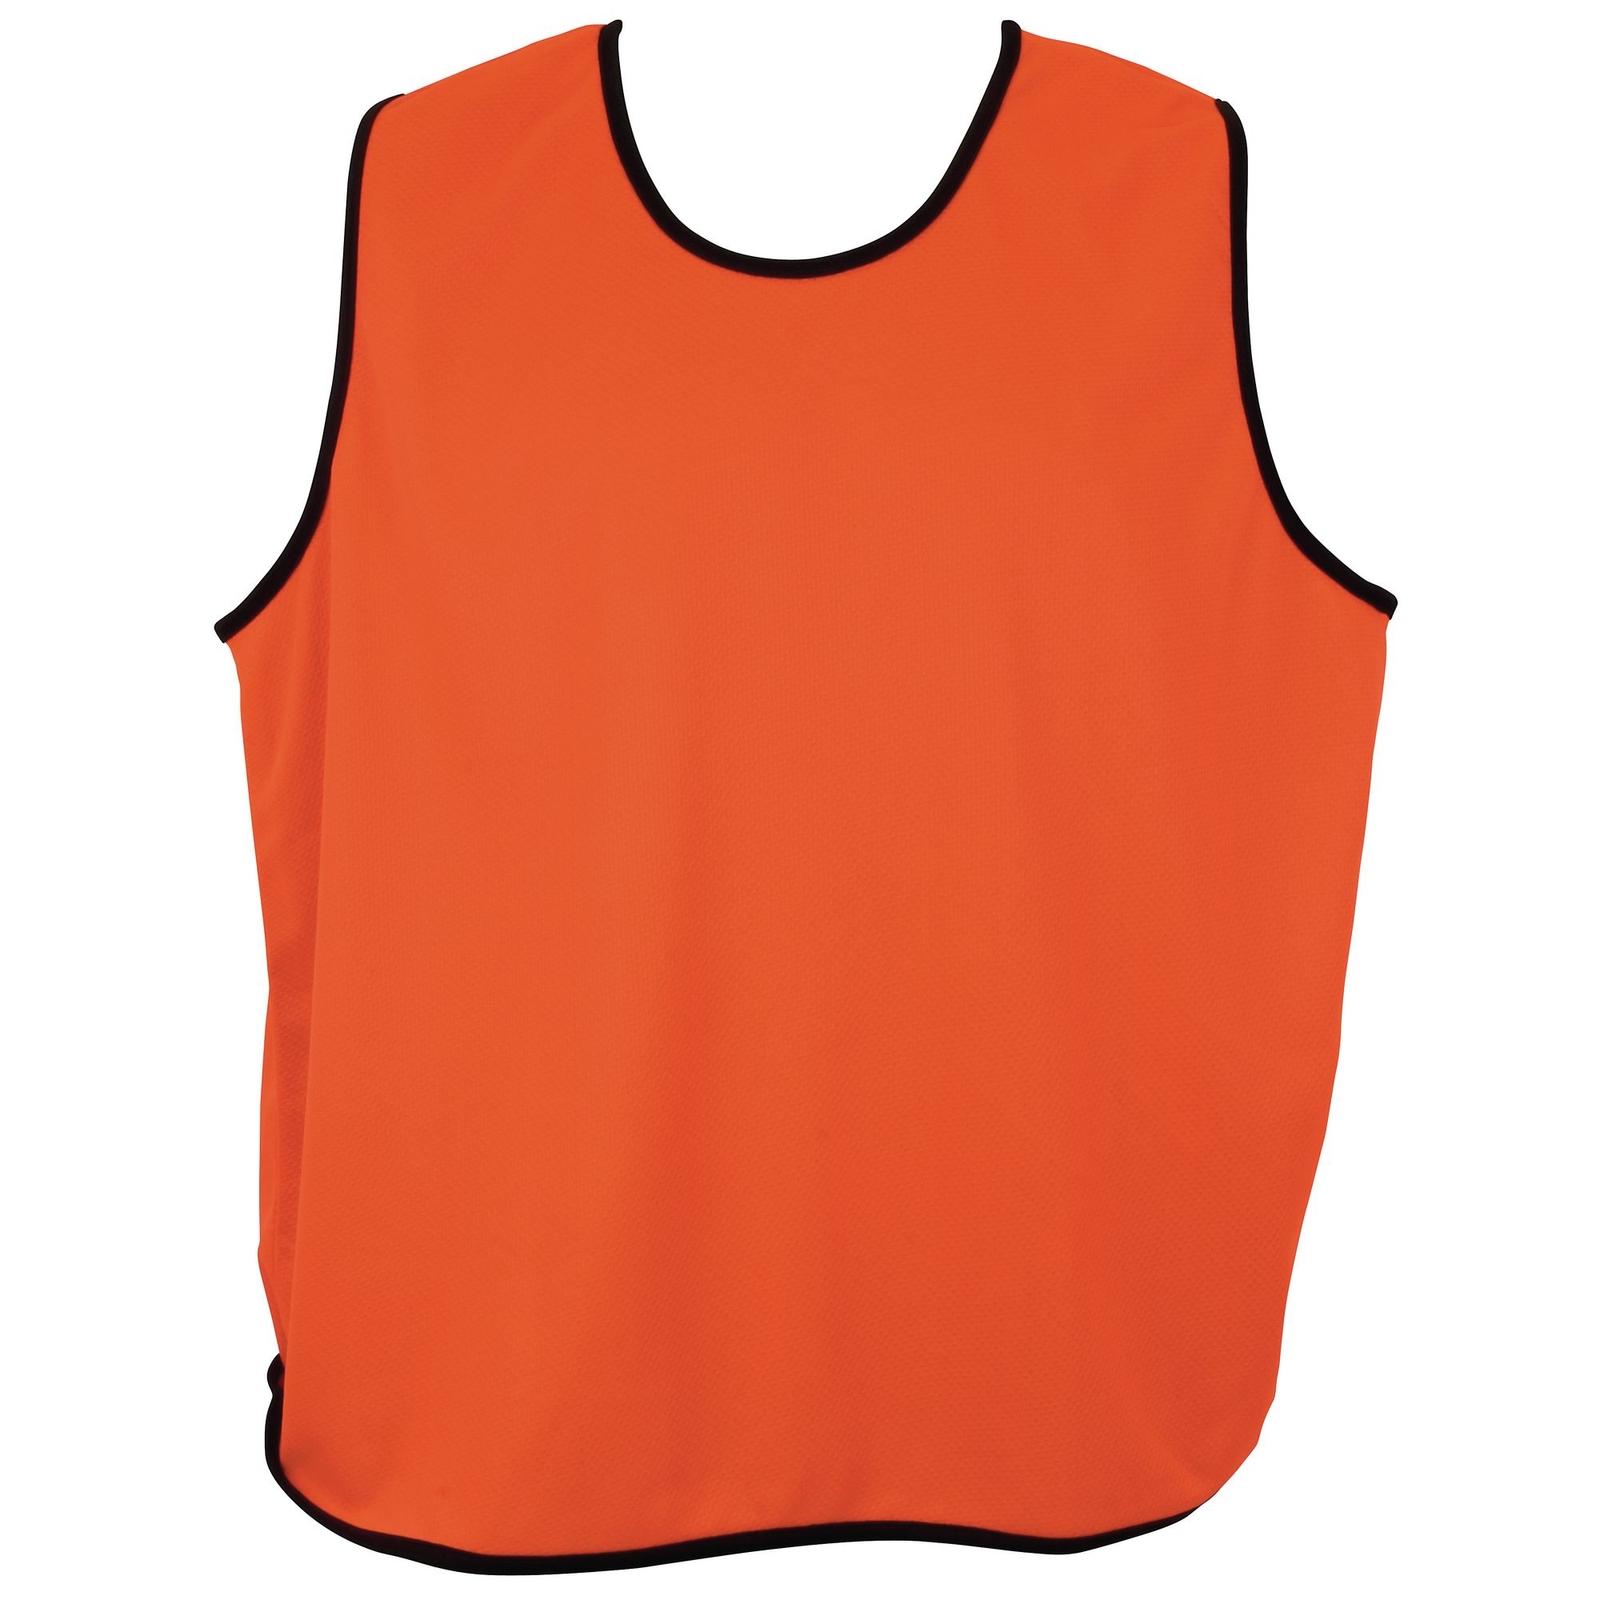 Precision Reversible Bib - Orange/Green - M/L